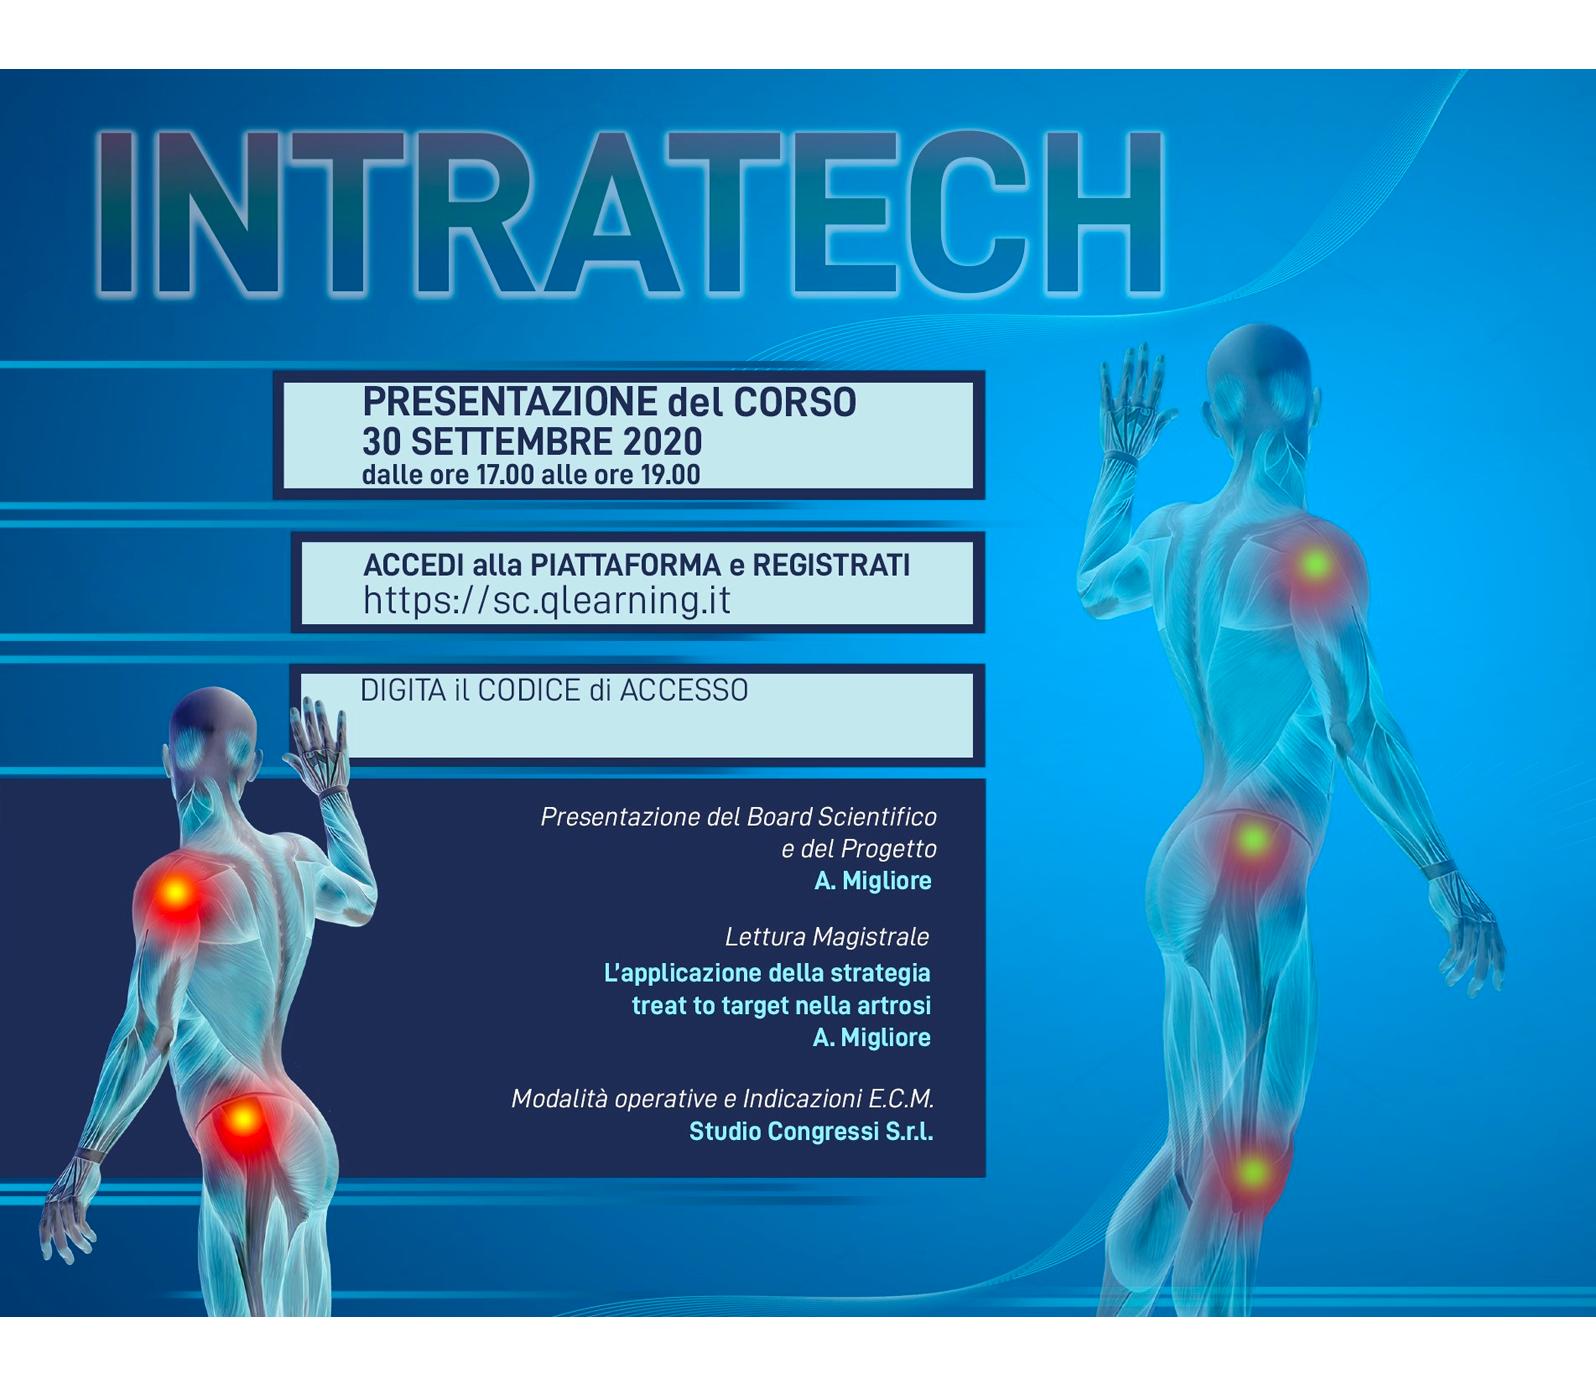 30/09/20-Intratech: Presentazione